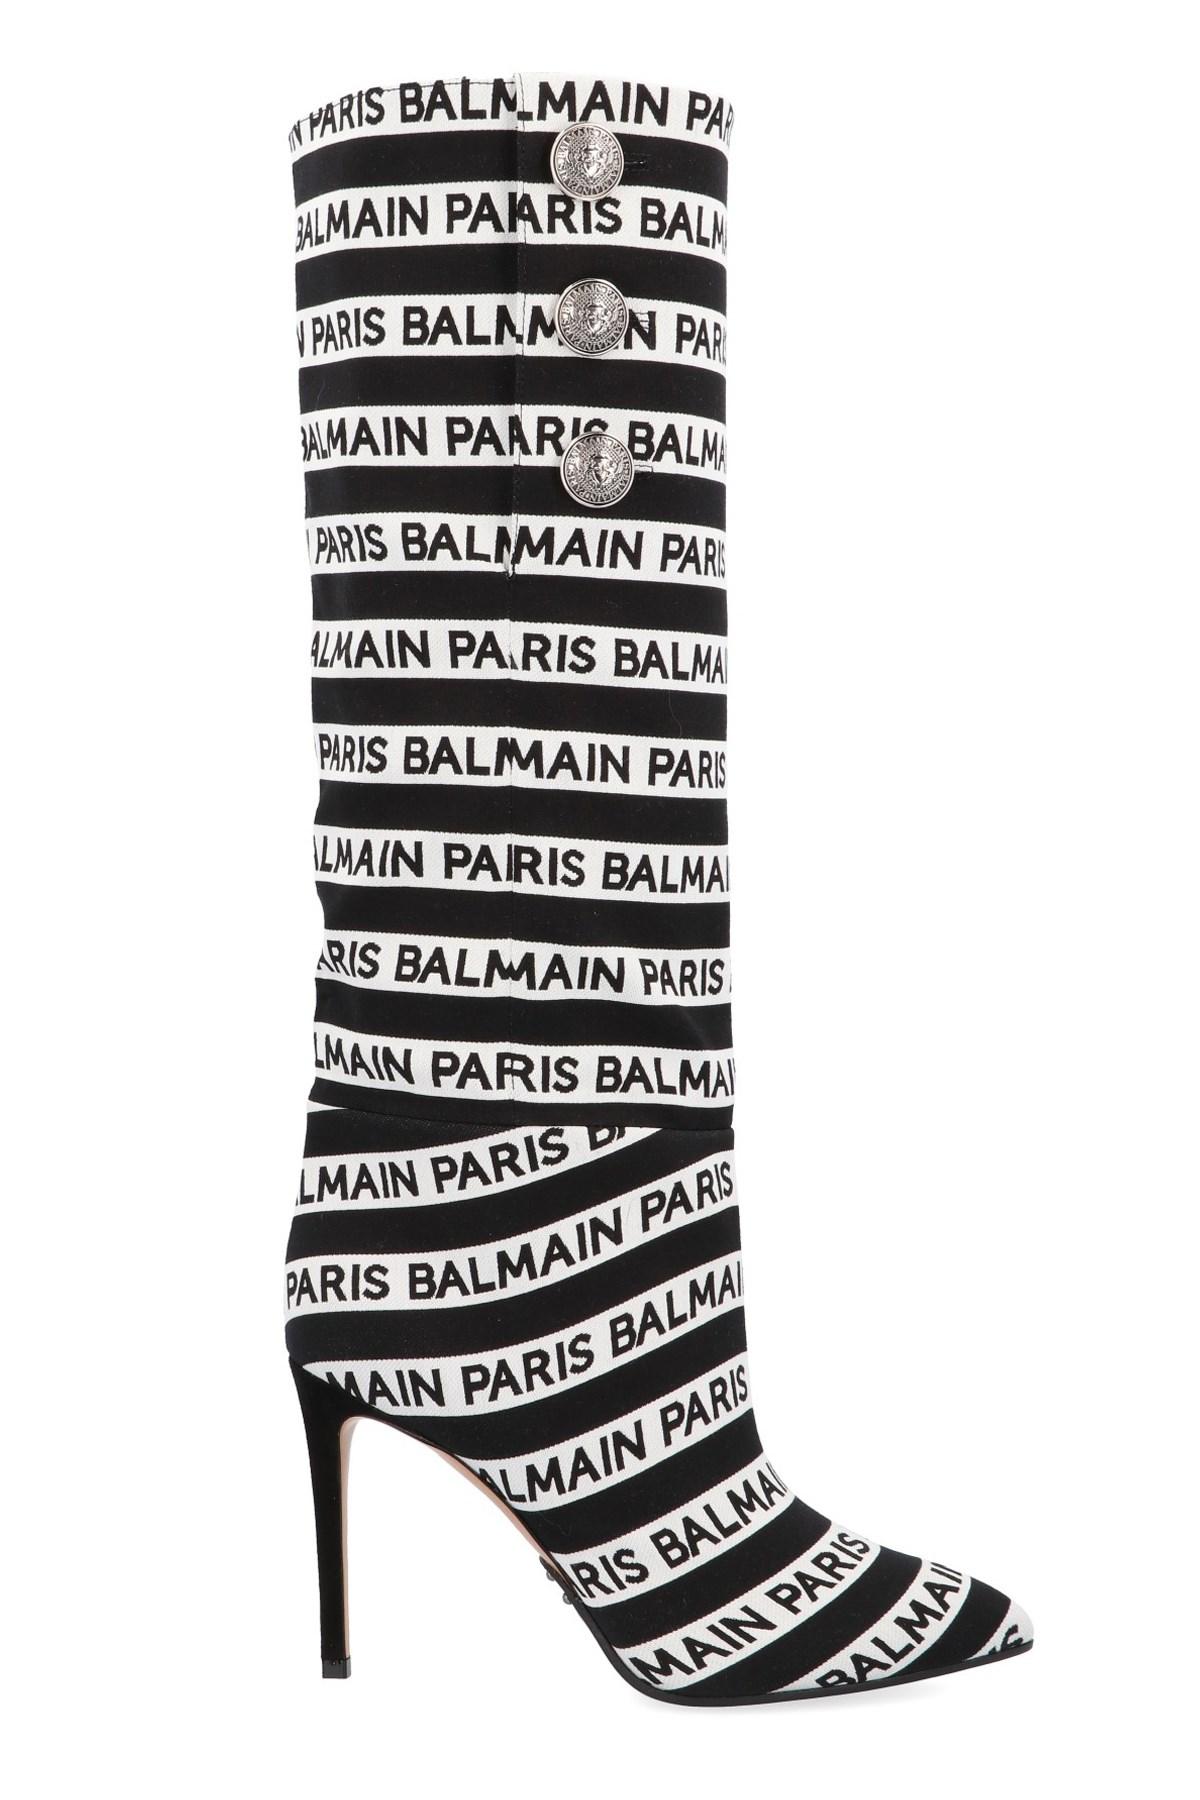 a3c094f2e9 balmain 'Jane' boots available on julian-fashion.com - 67211